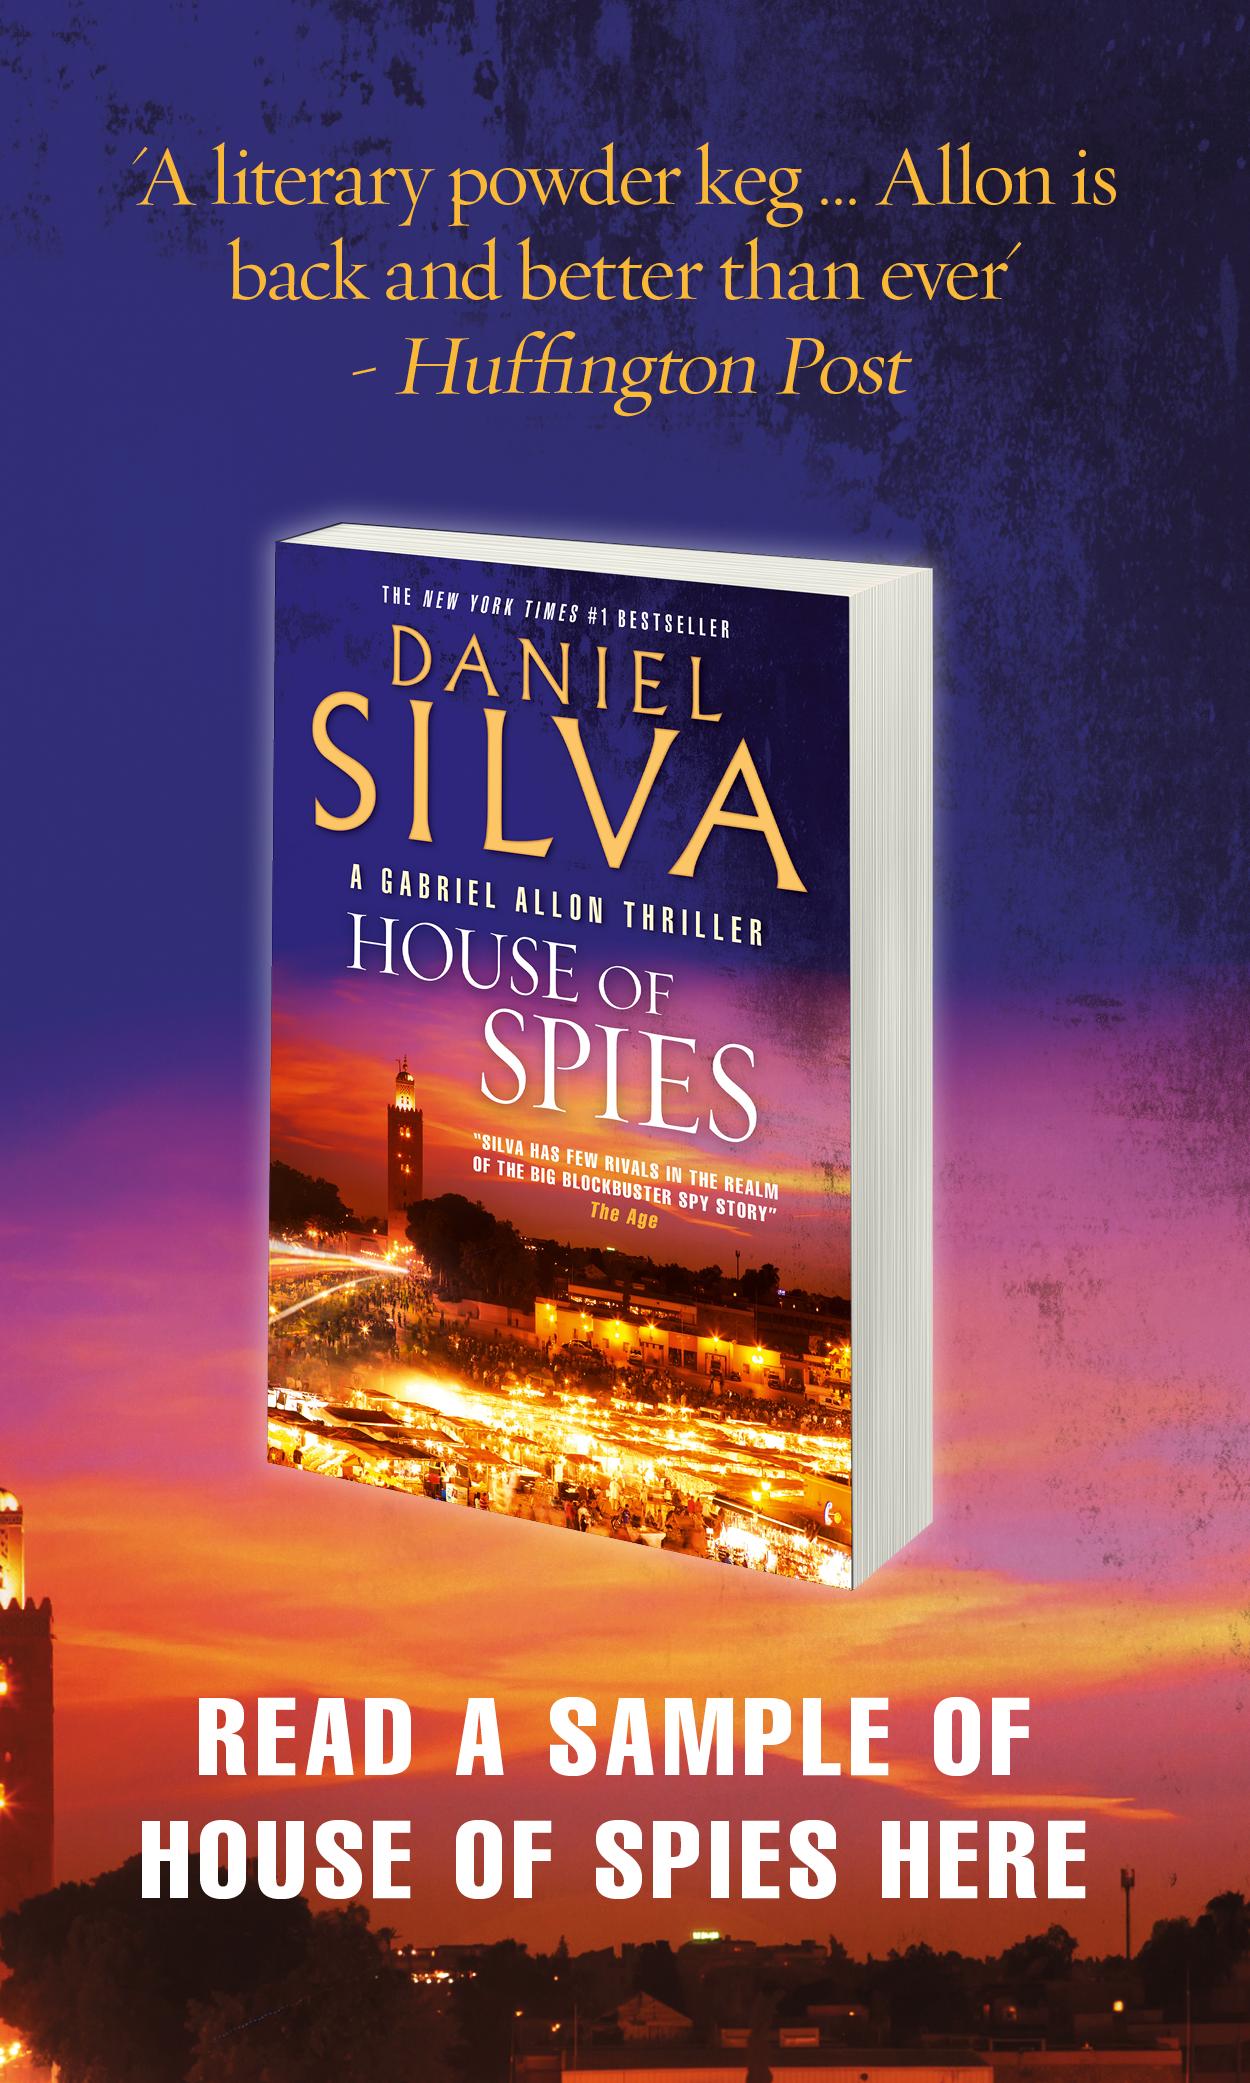 House of Spies Reading, Daniel silva, Best sellers